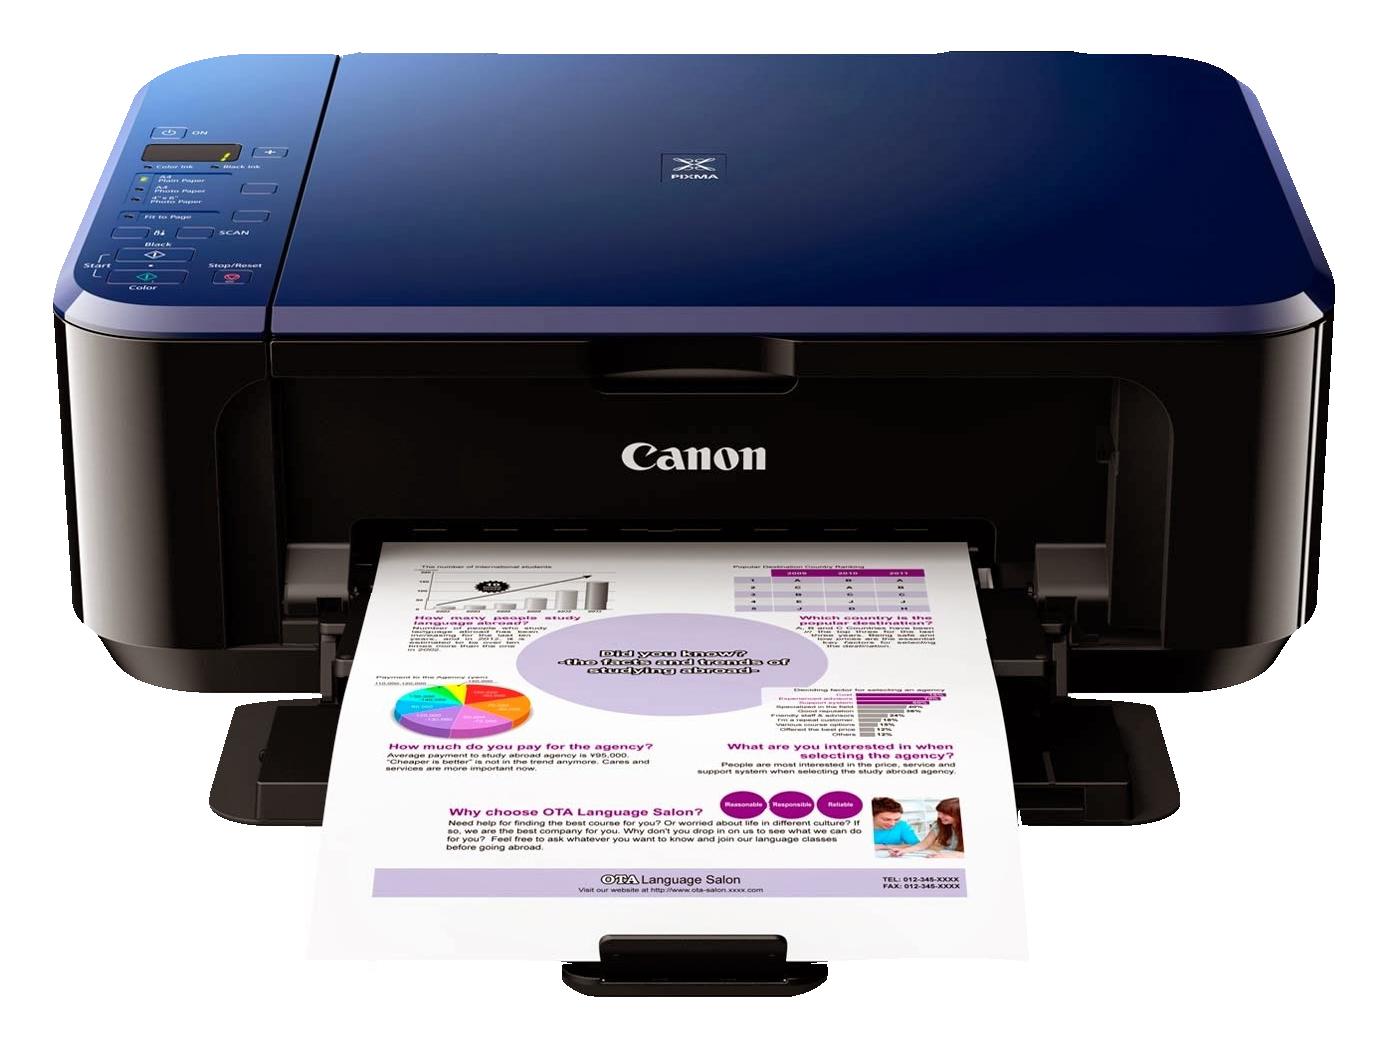 Canon Color Photo Printer PNG Image.